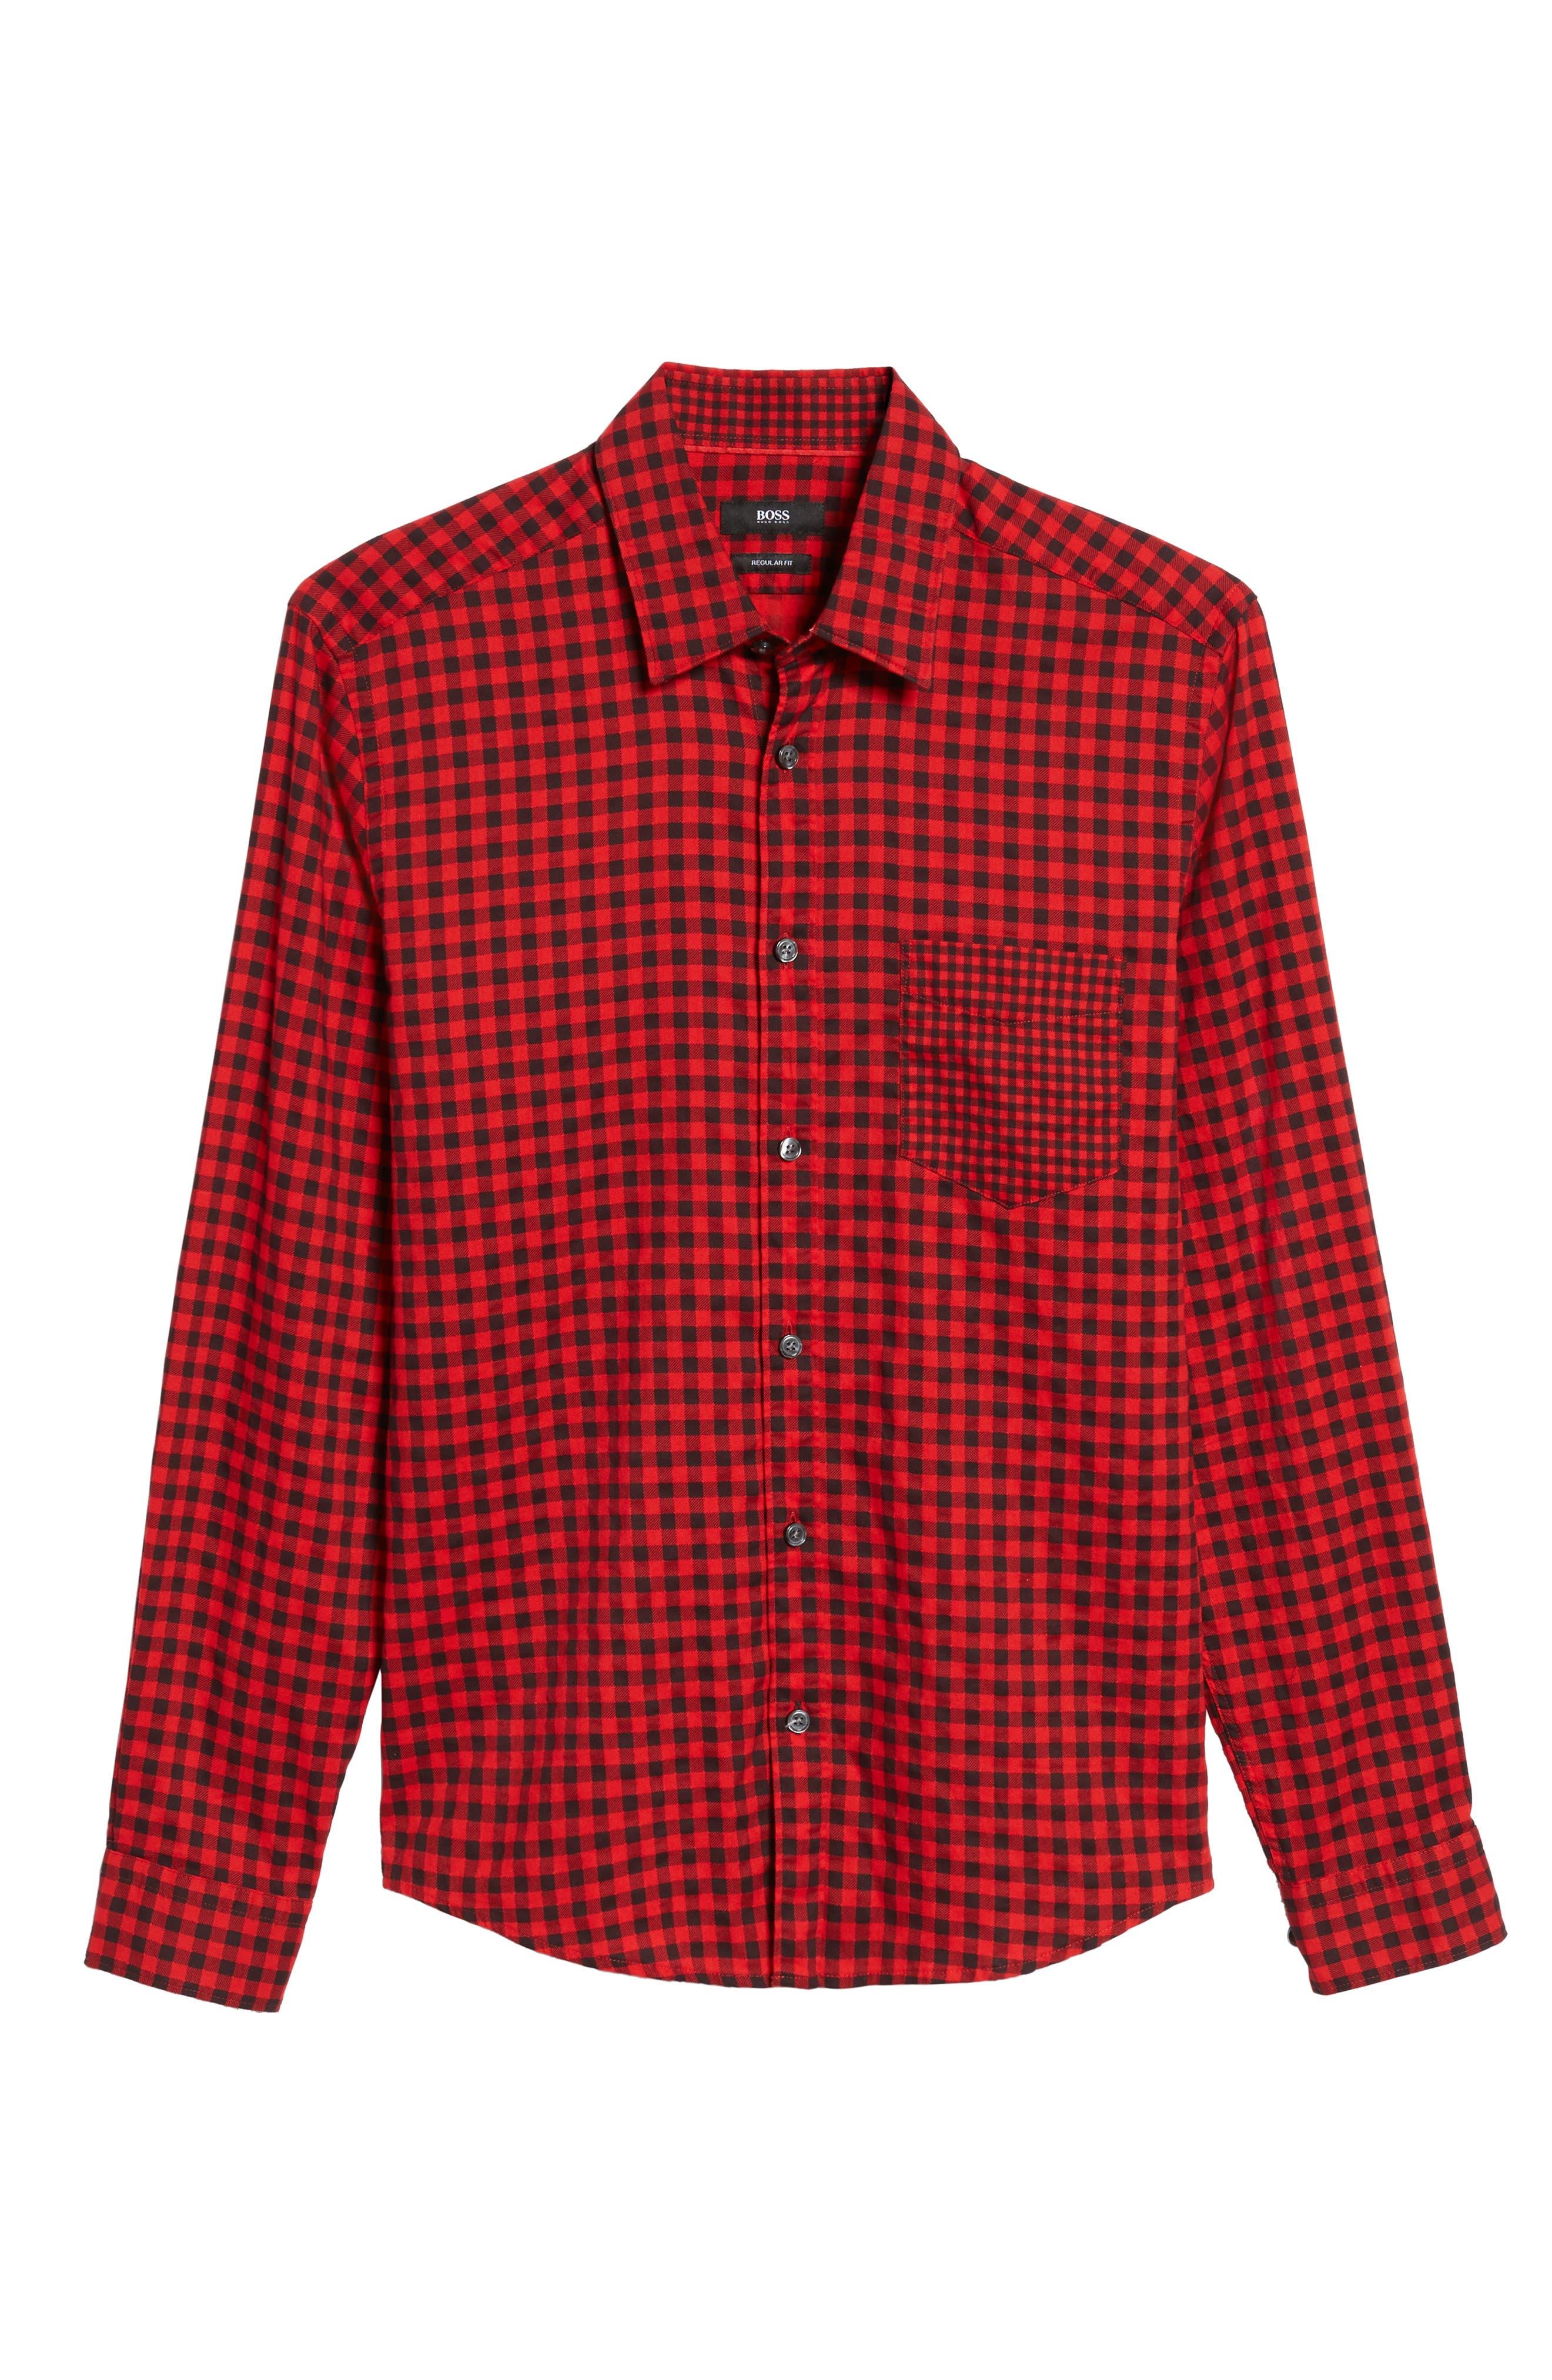 Lance Regular Fit Gingham Check Twill Sport Shirt,                             Alternate thumbnail 6, color,                             Red